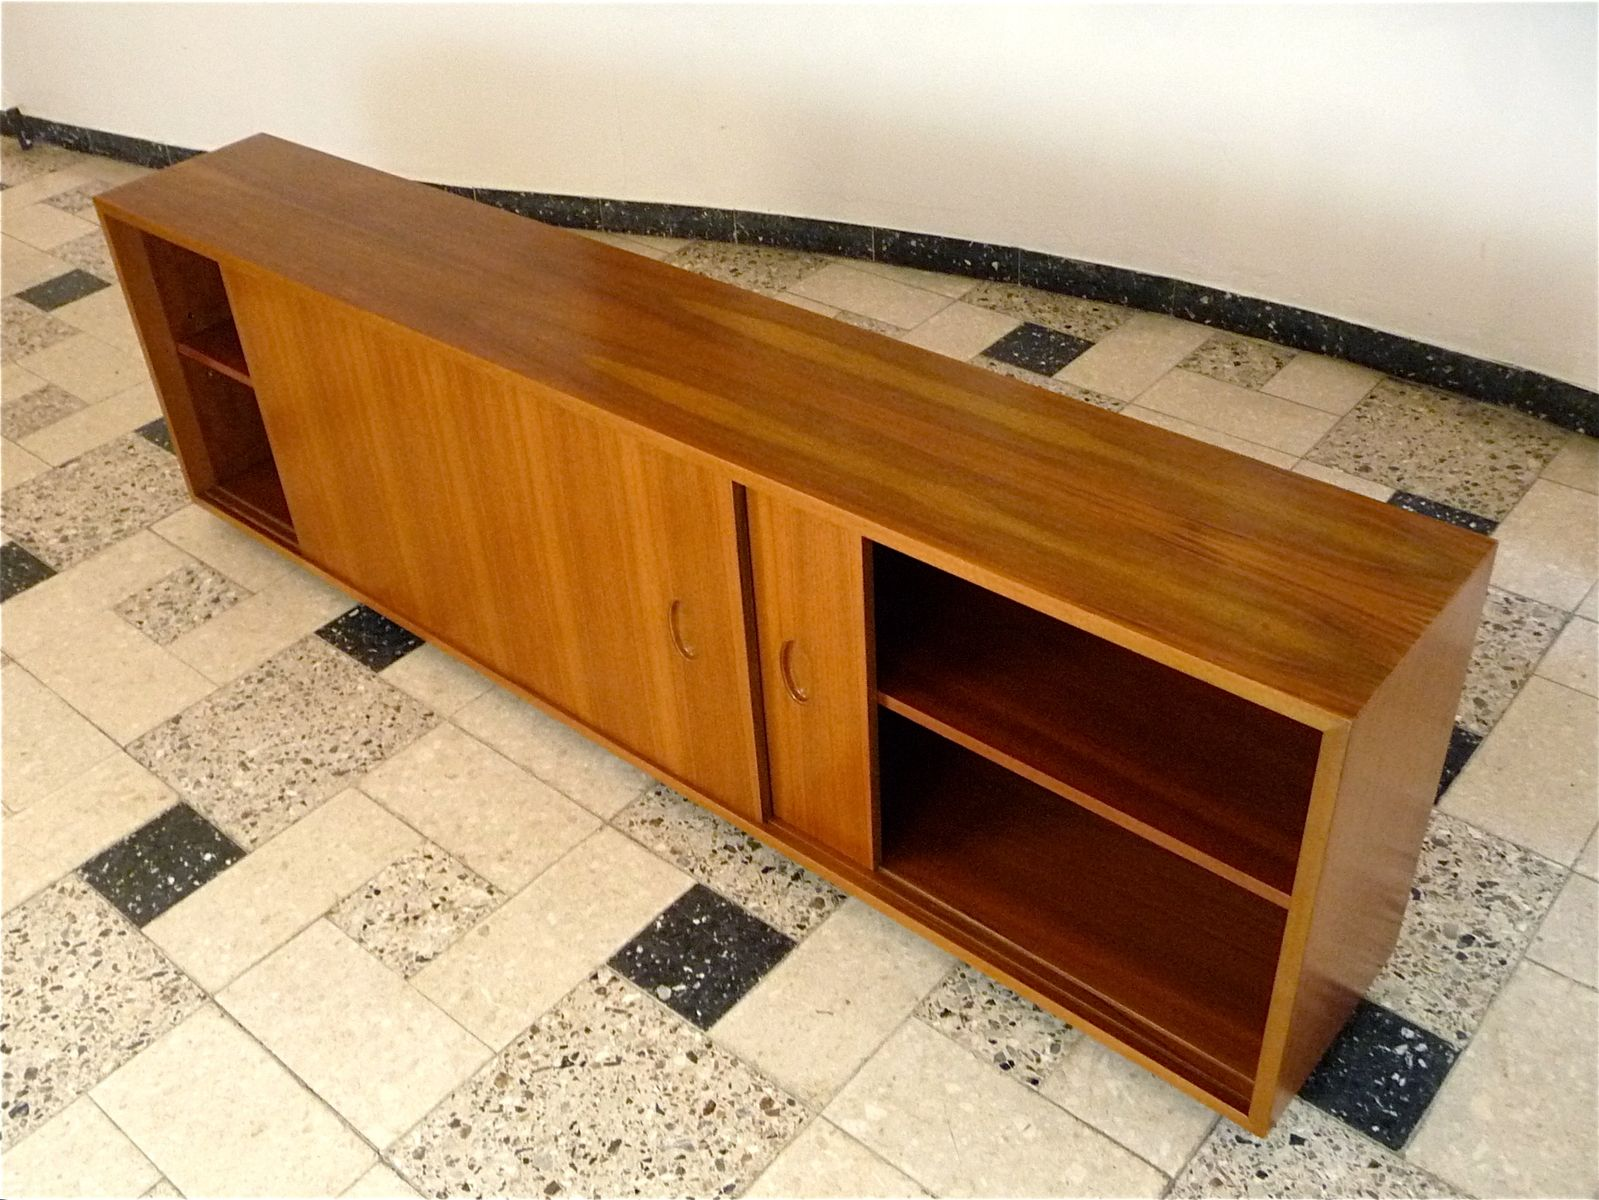 schwebendes sideboard von georg satink f r wk m bel. Black Bedroom Furniture Sets. Home Design Ideas